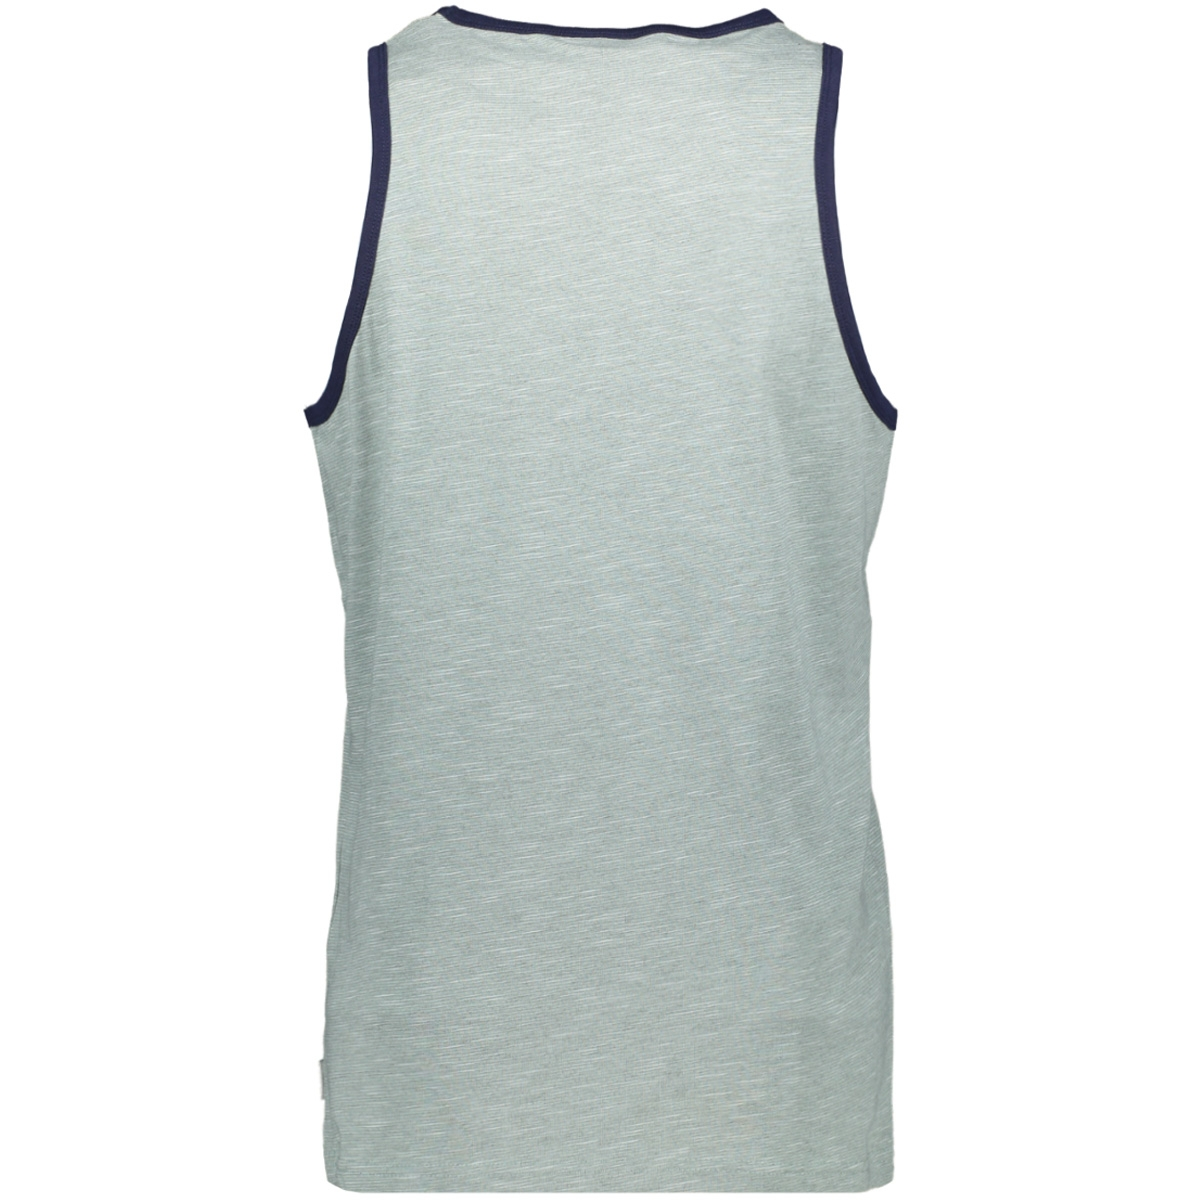 jcomick tee s/l crew neck 12152171 jack & jones t-shirt blue surf